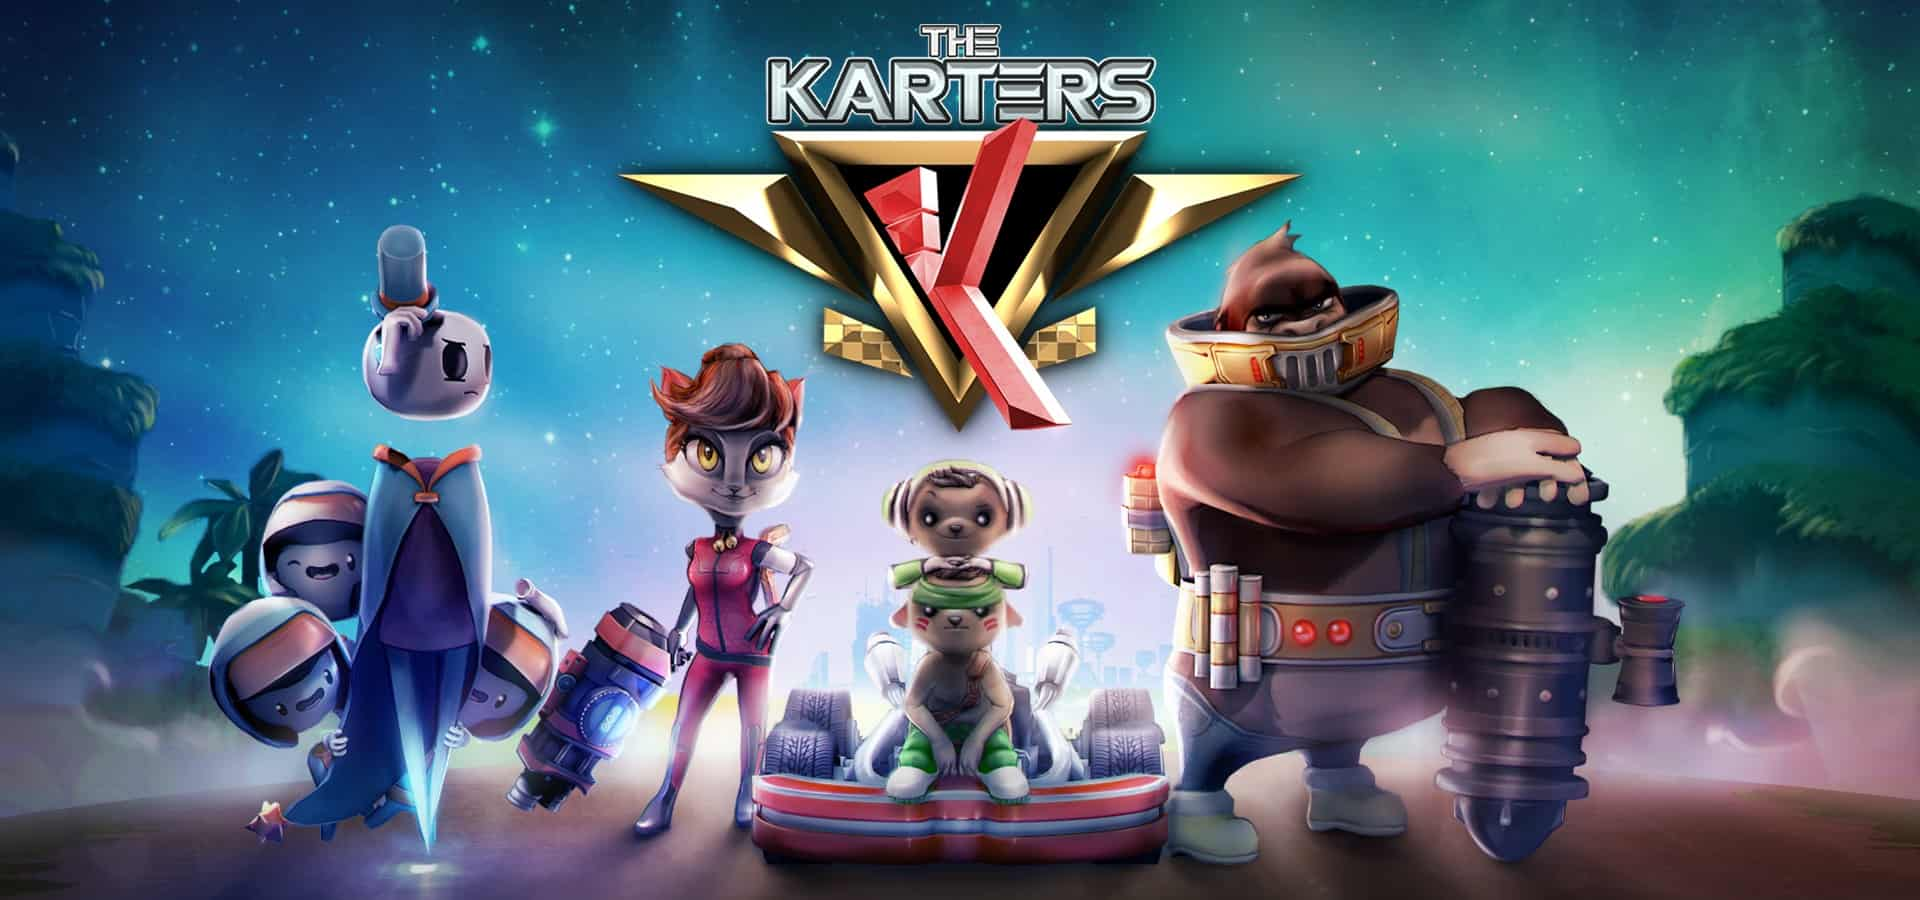 the karters 4